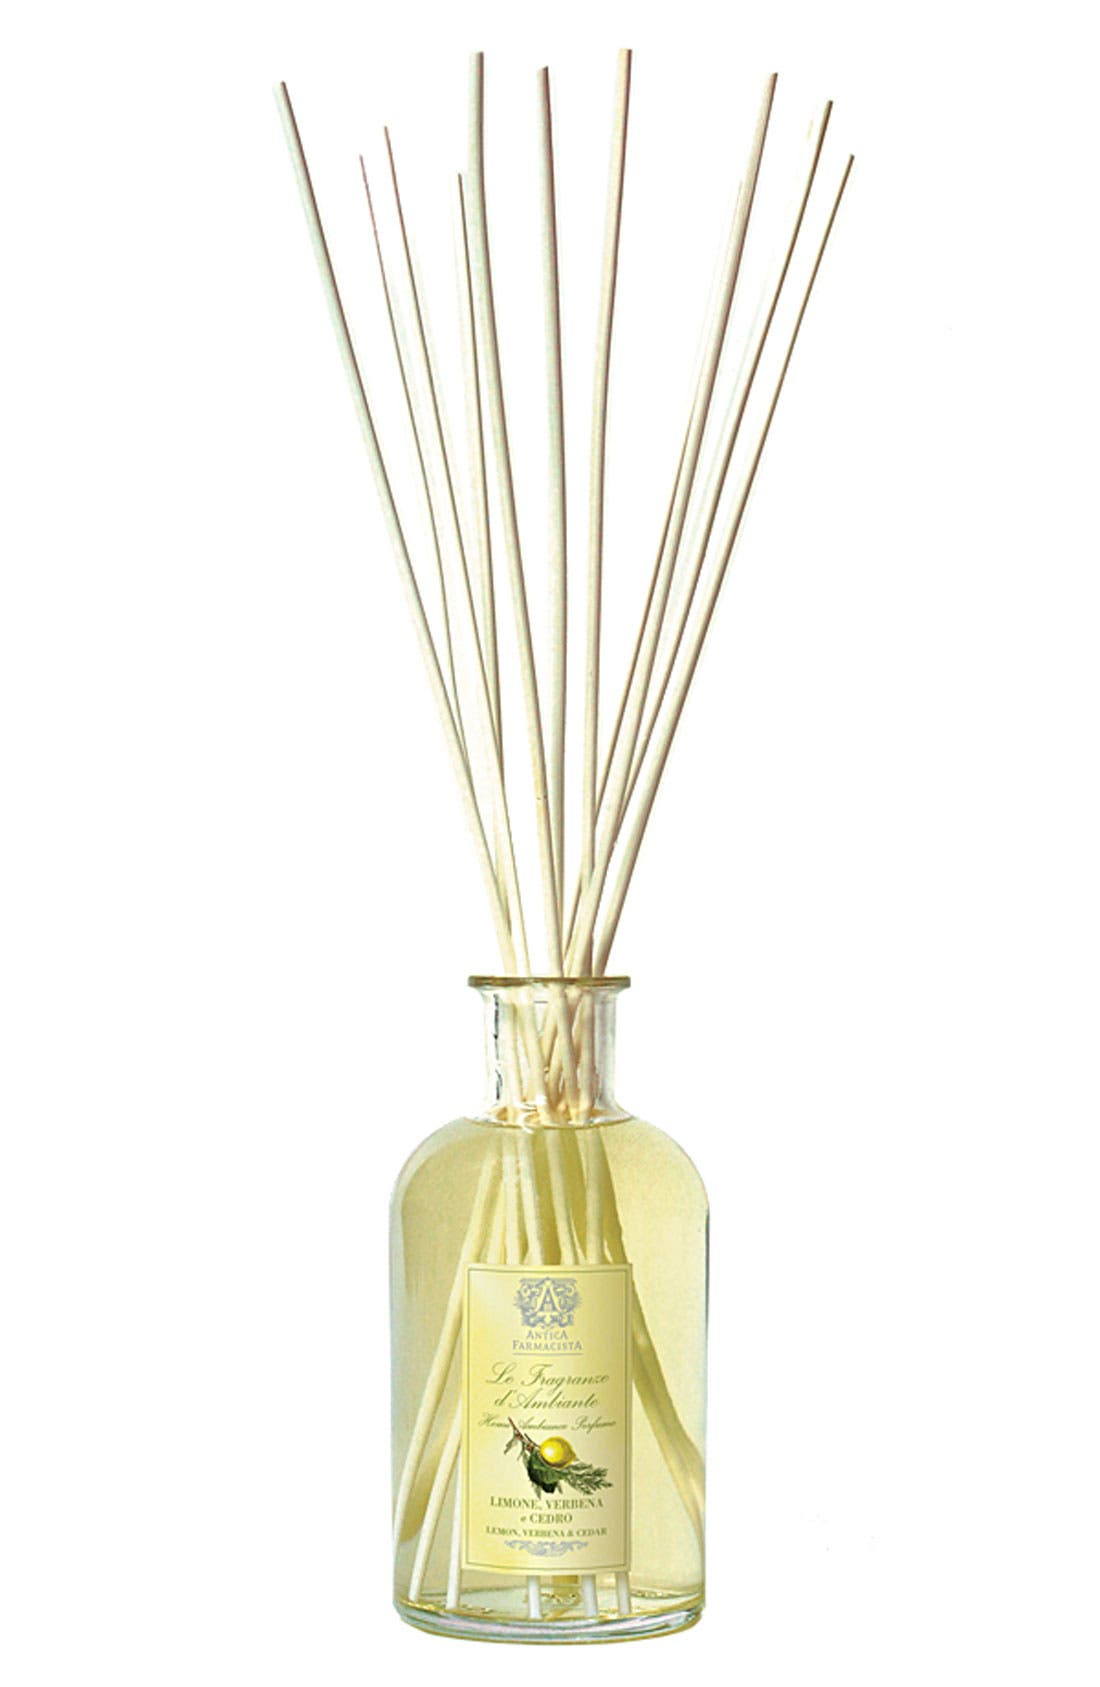 Antica Farmacista 'Lemon, Verbena & Cedar' Home Ambiance Perfume